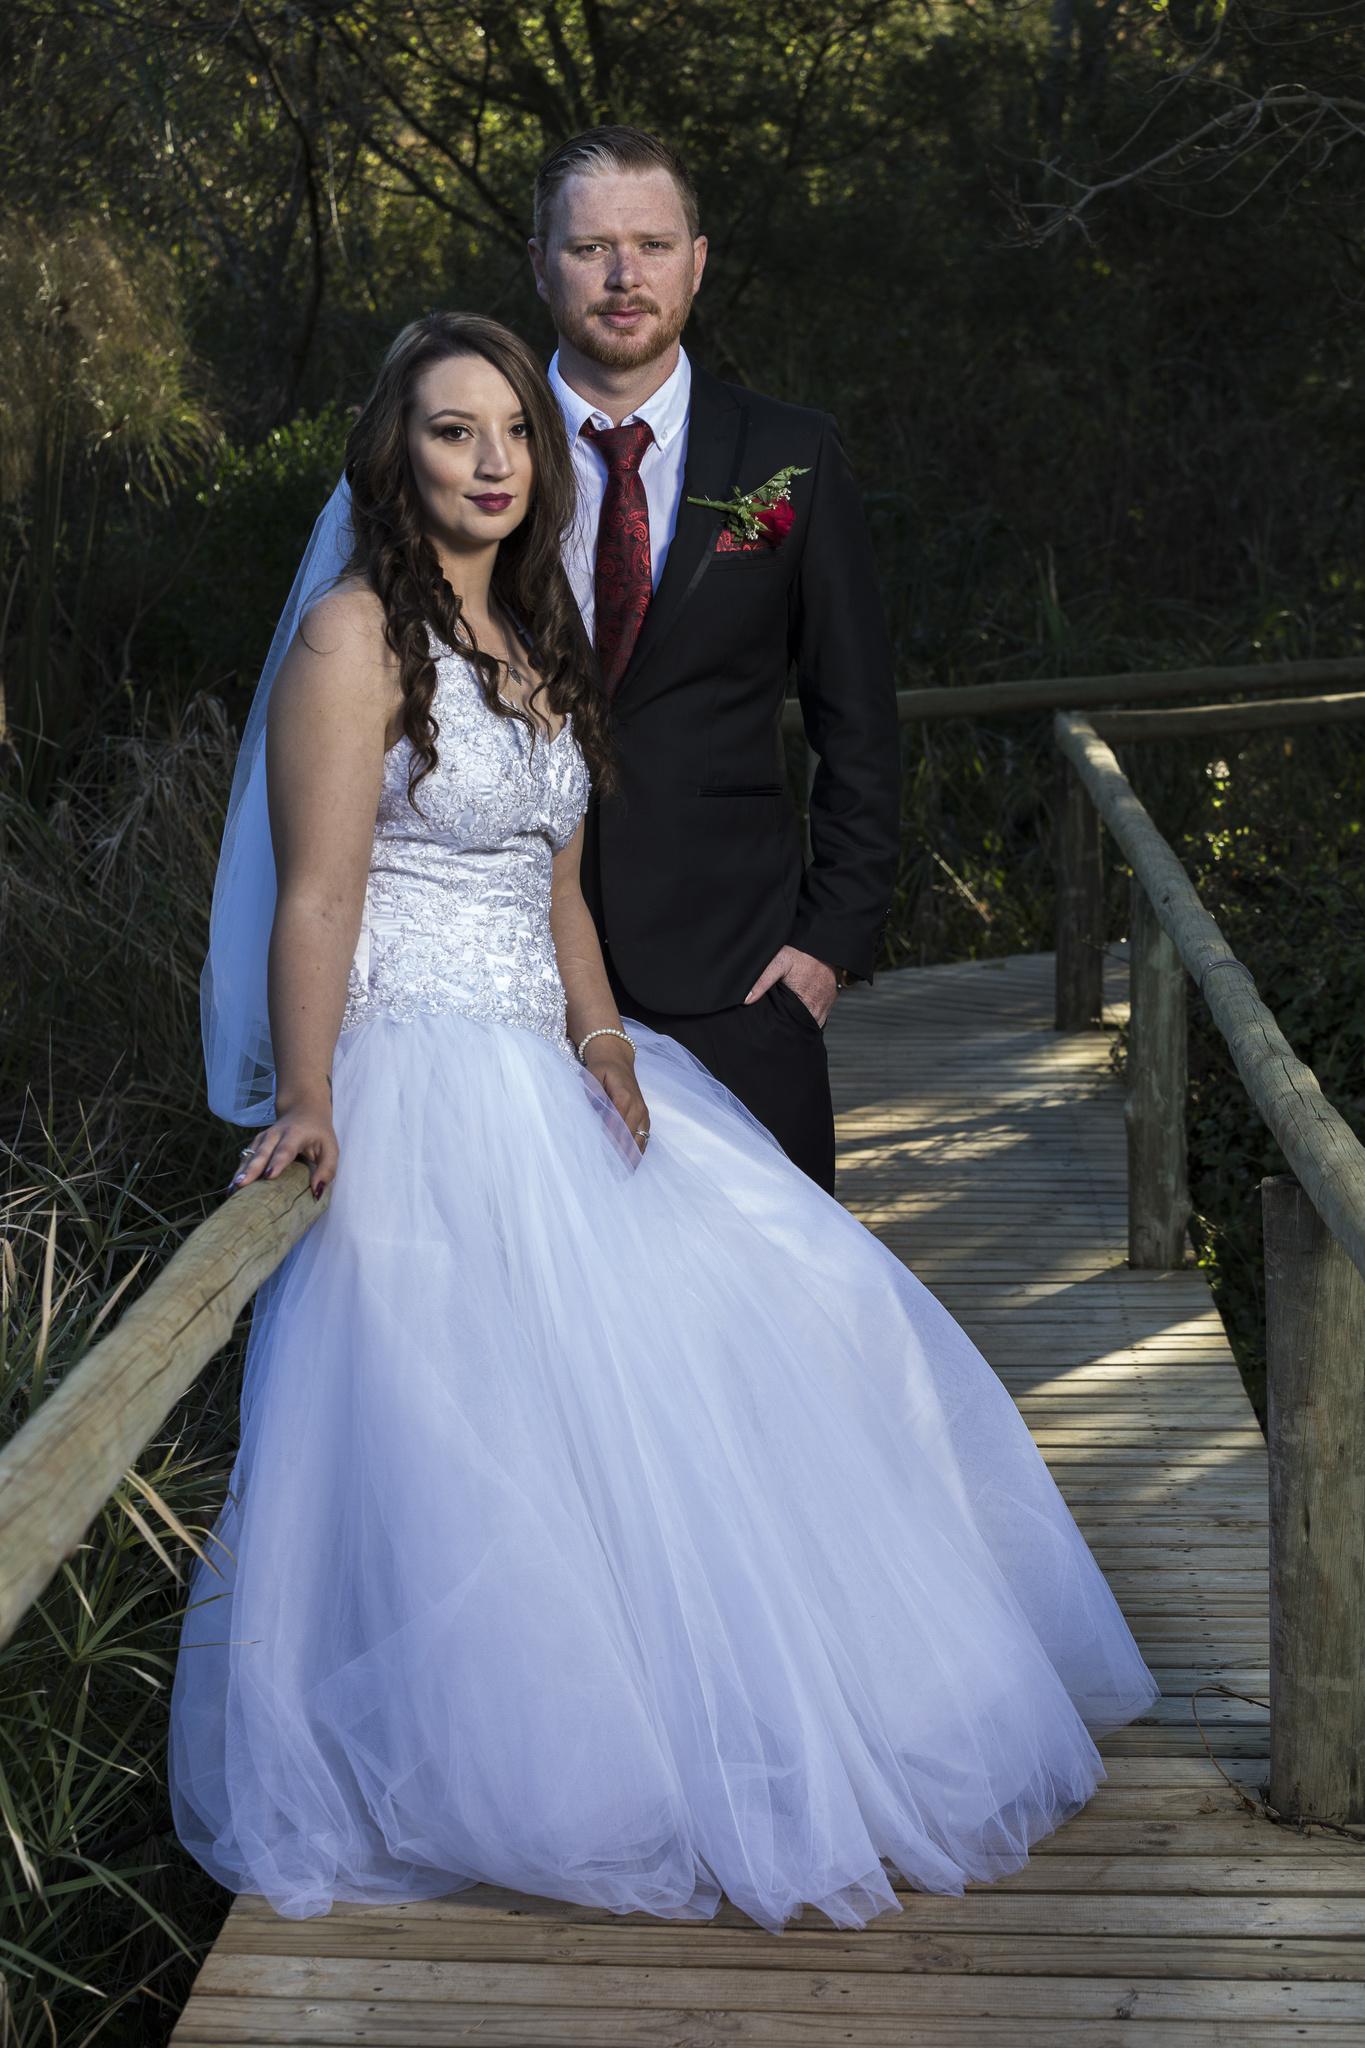 JP and Lourensa Wedding Day (5).jpg